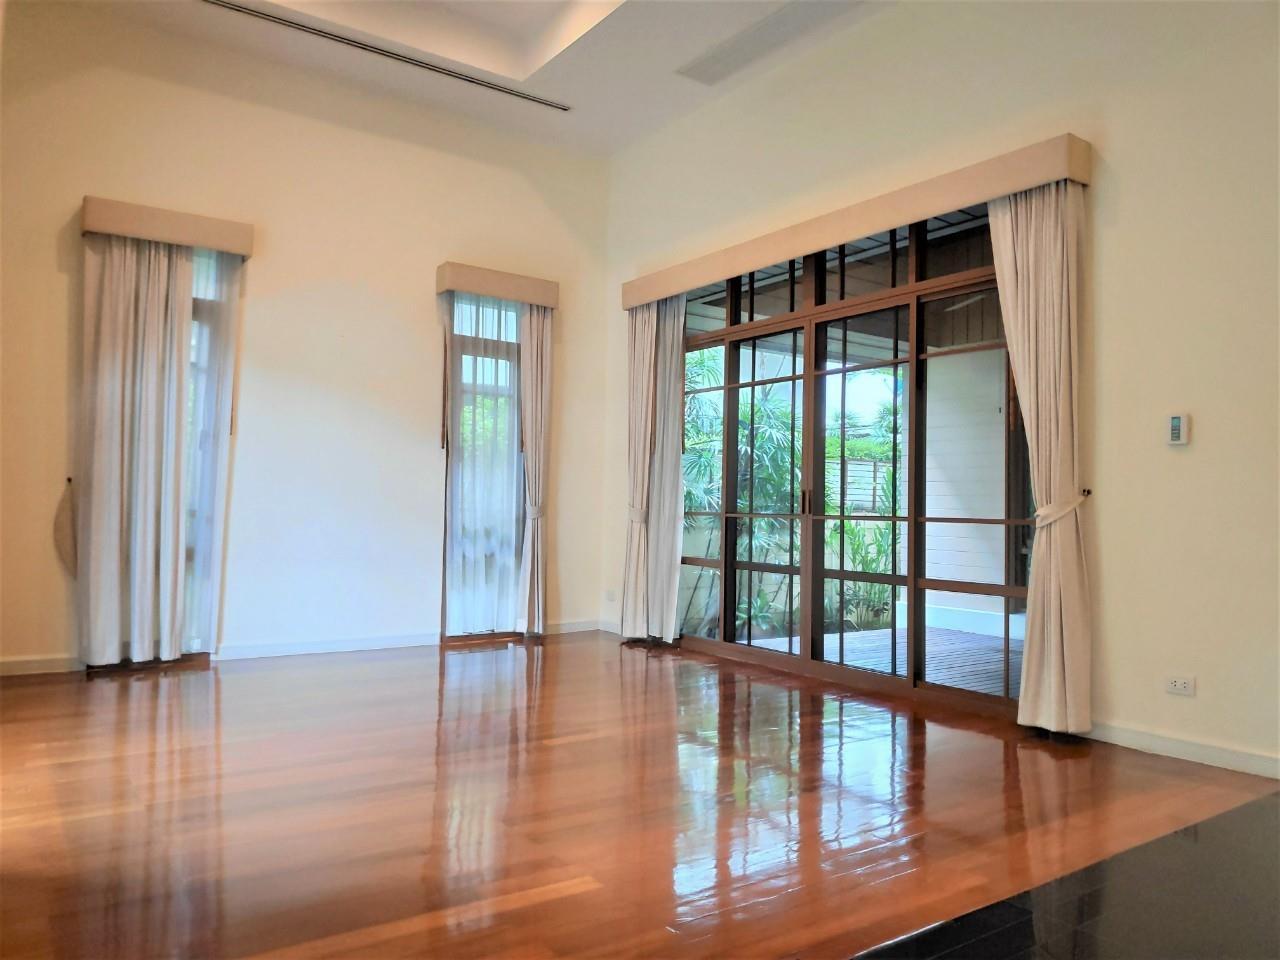 Agent - Natchga Boonkrong  Agency's For Rent House 4 Bedrooms Baan Sansiri Sukhumvit 67 9